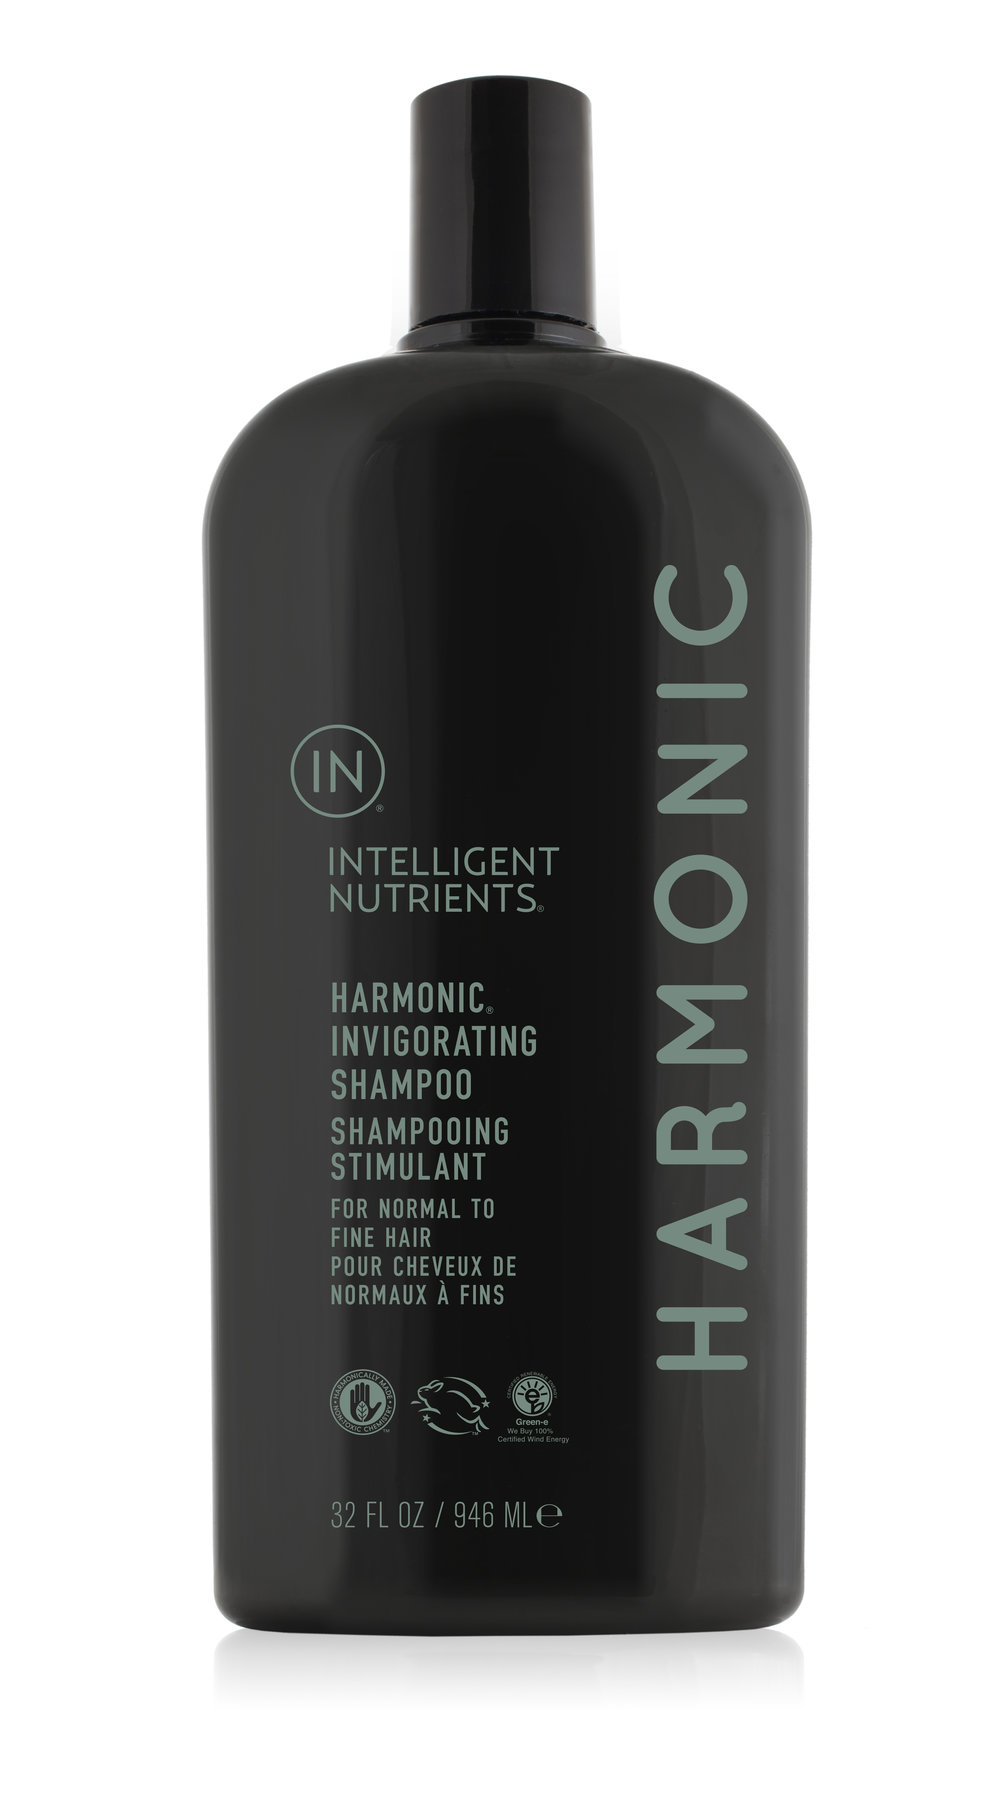 Harmonic Shampoo (DKK440/946ml)